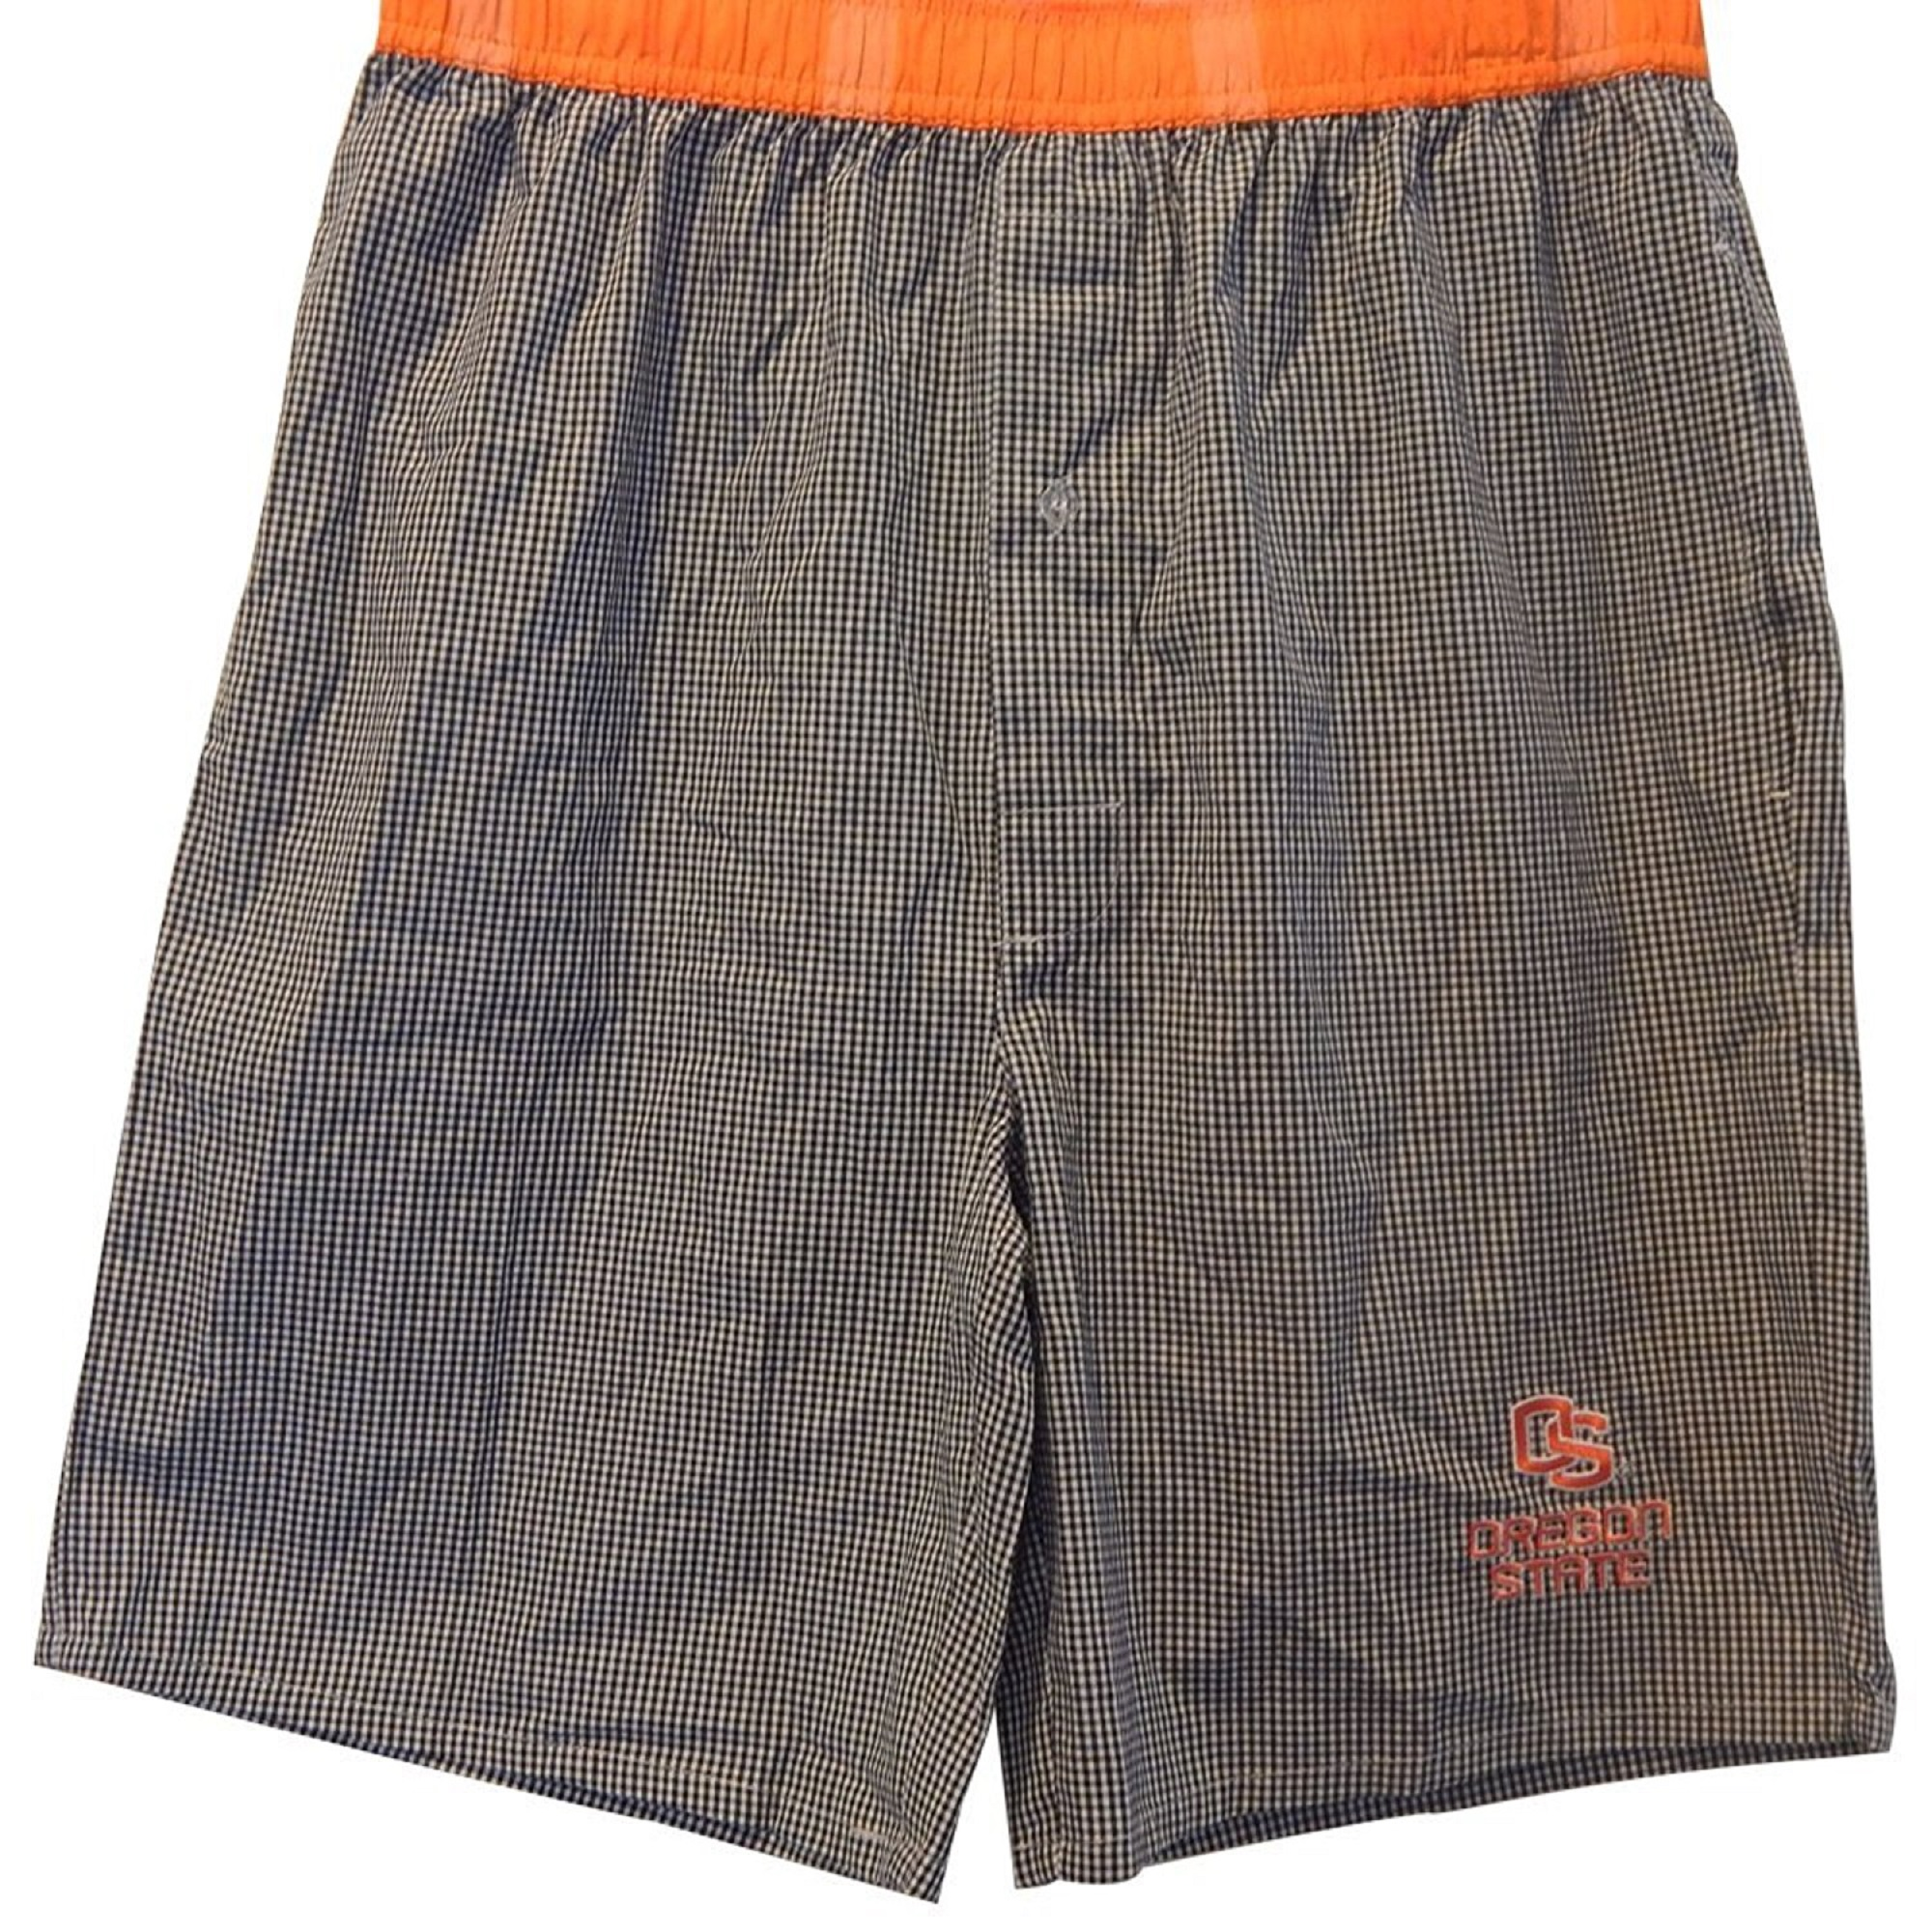 OS Oregon State Long Checked Boxer Shorts Board Shorts Jams Black White Orange (Large) by Sideline Apparel